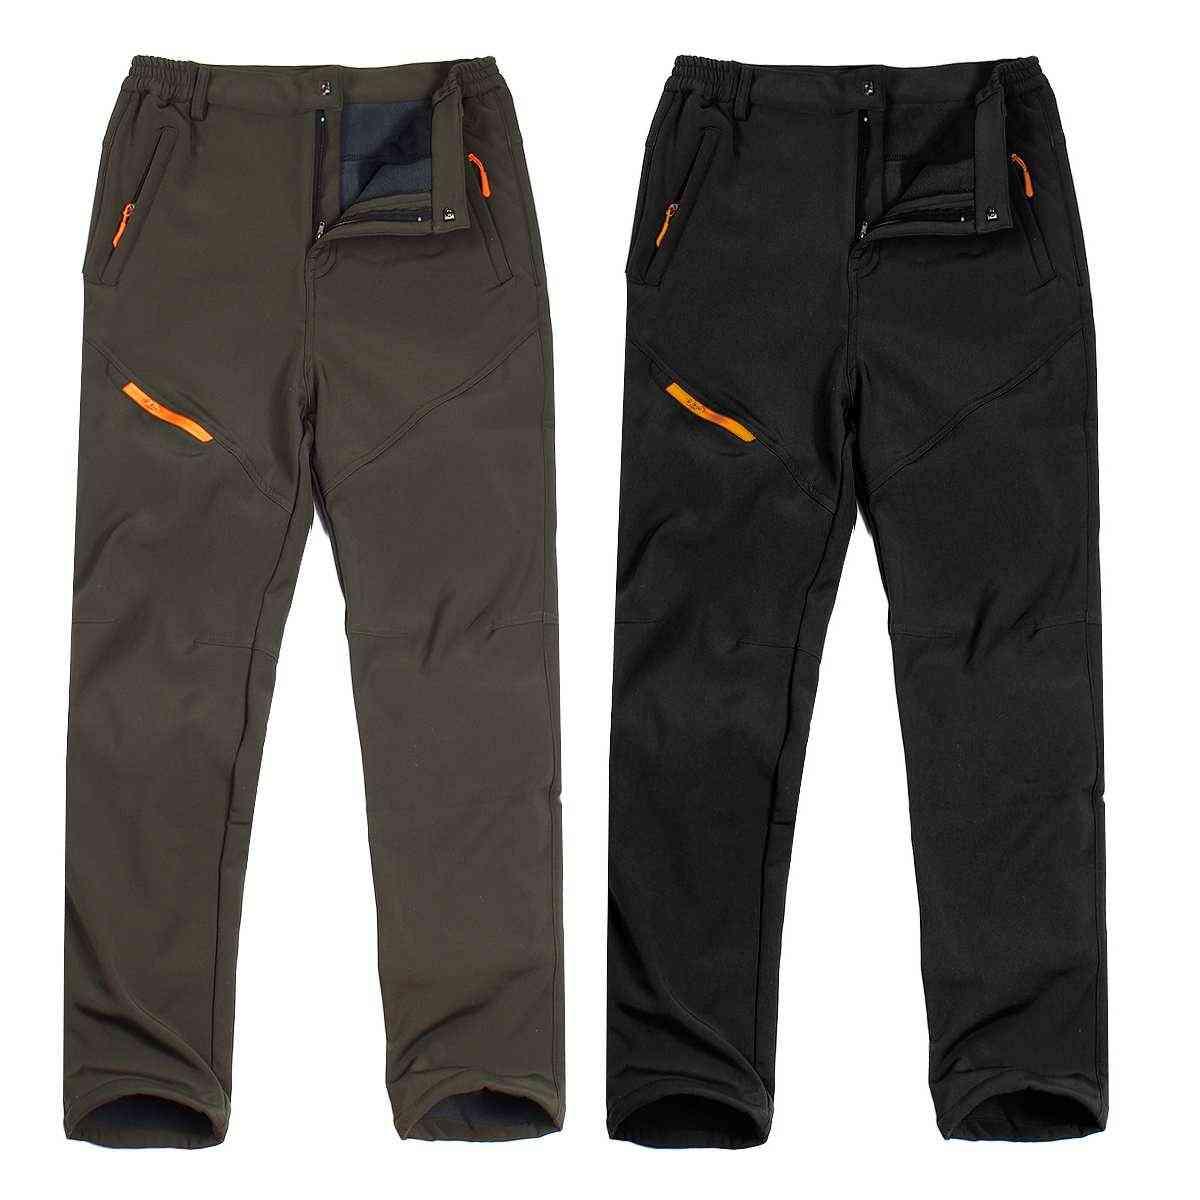 Men's Plus Velvet Thick Autumn And Winter Soft Shell Pants Trousers, -40 Degree Snow Ski Pant For Male / Female